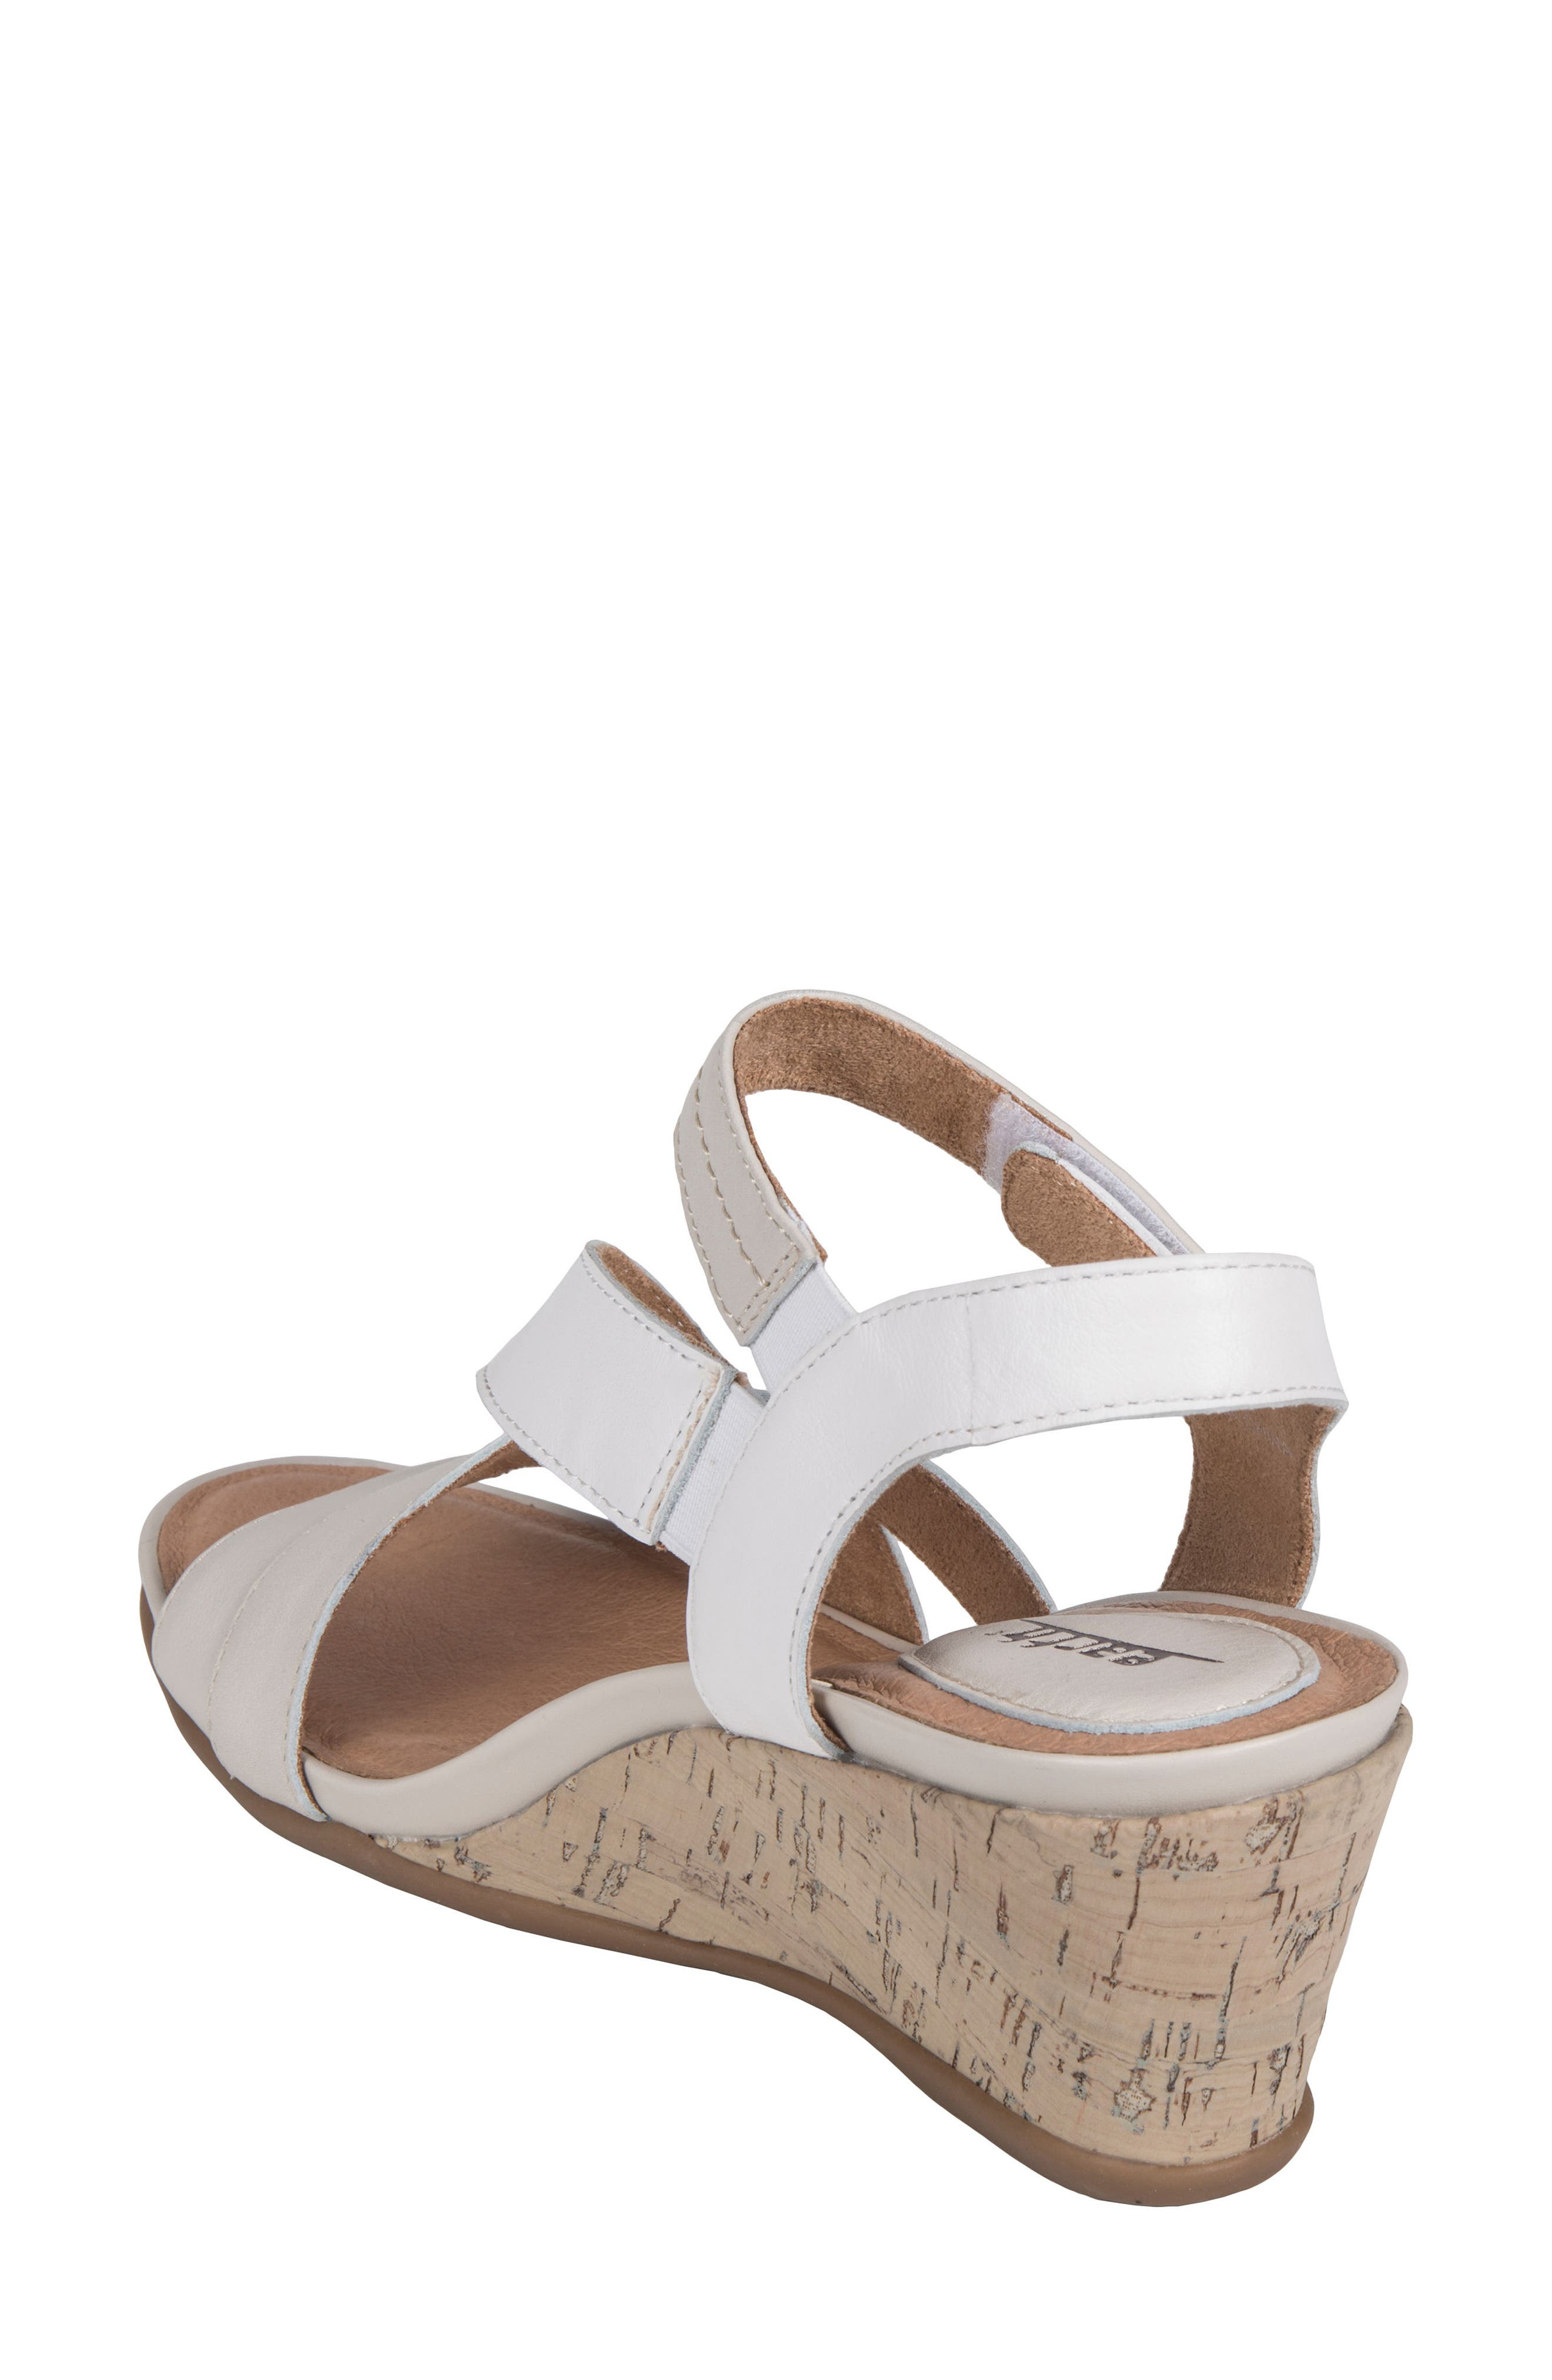 Thistle Wedge Sandal,                             Alternate thumbnail 6, color,